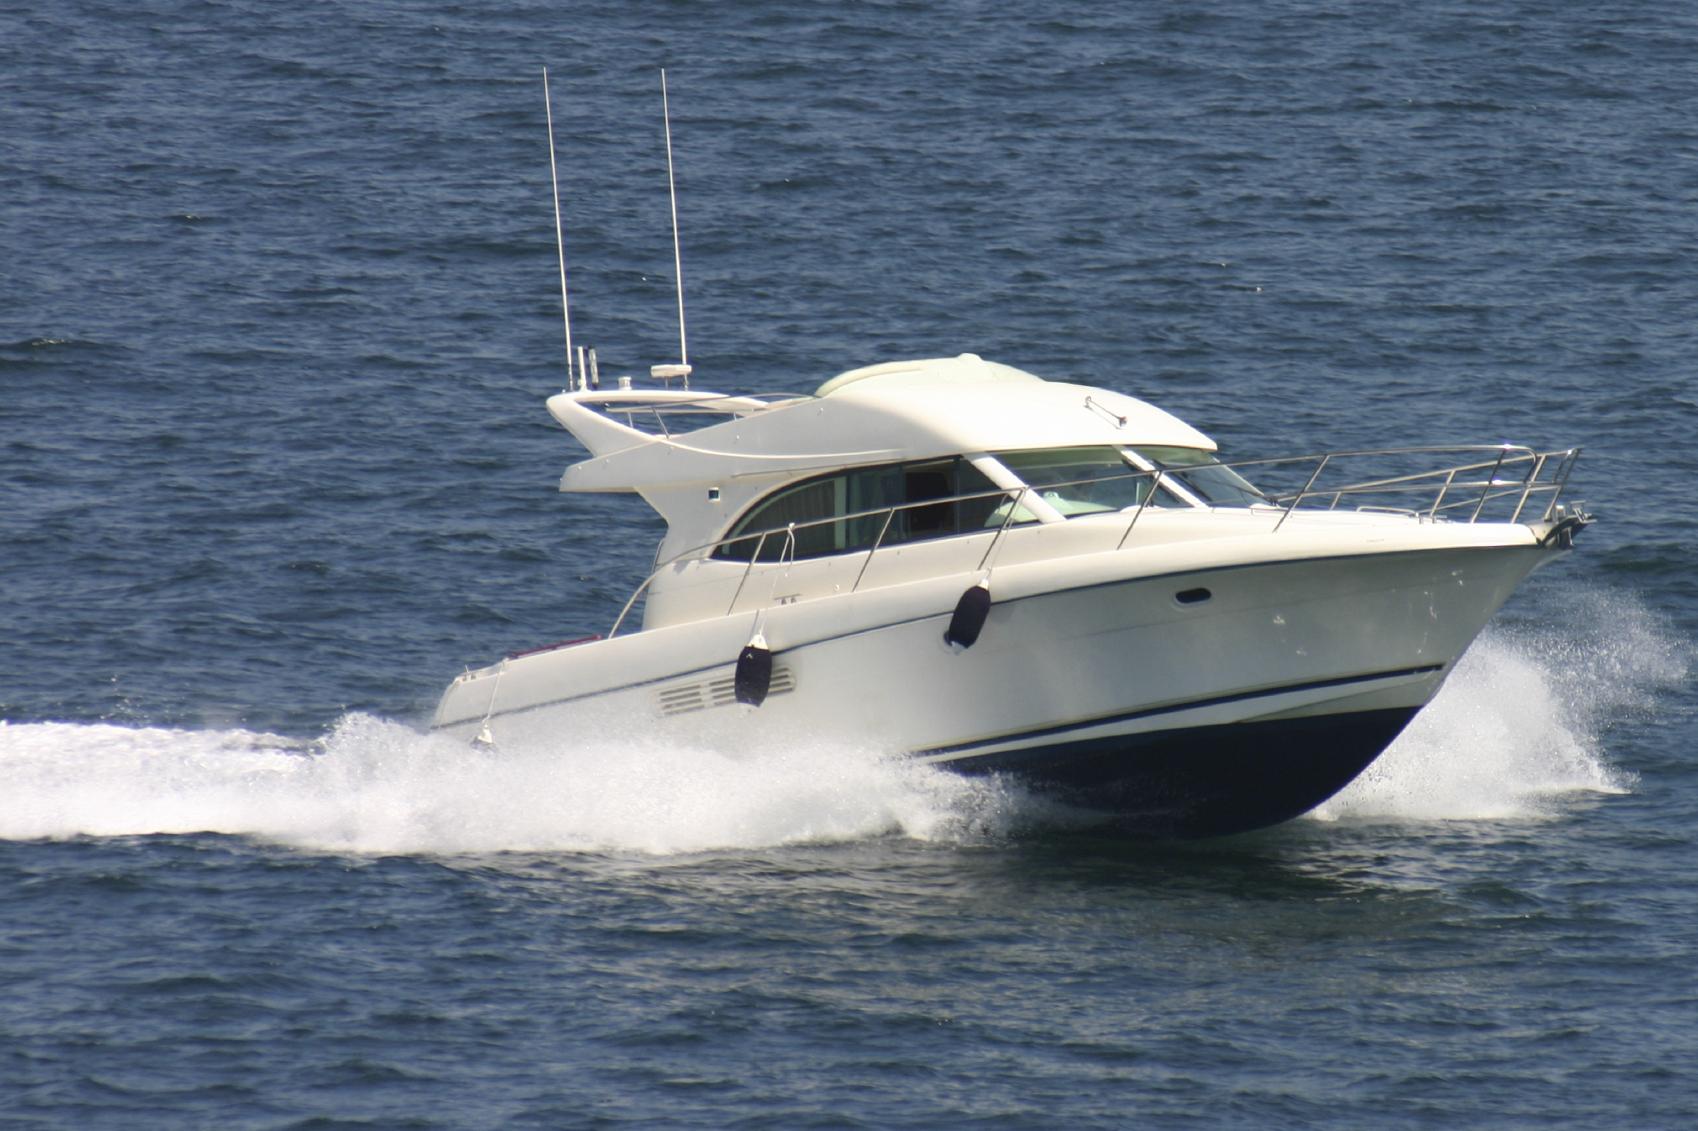 Cape Cod Boater's Insurance